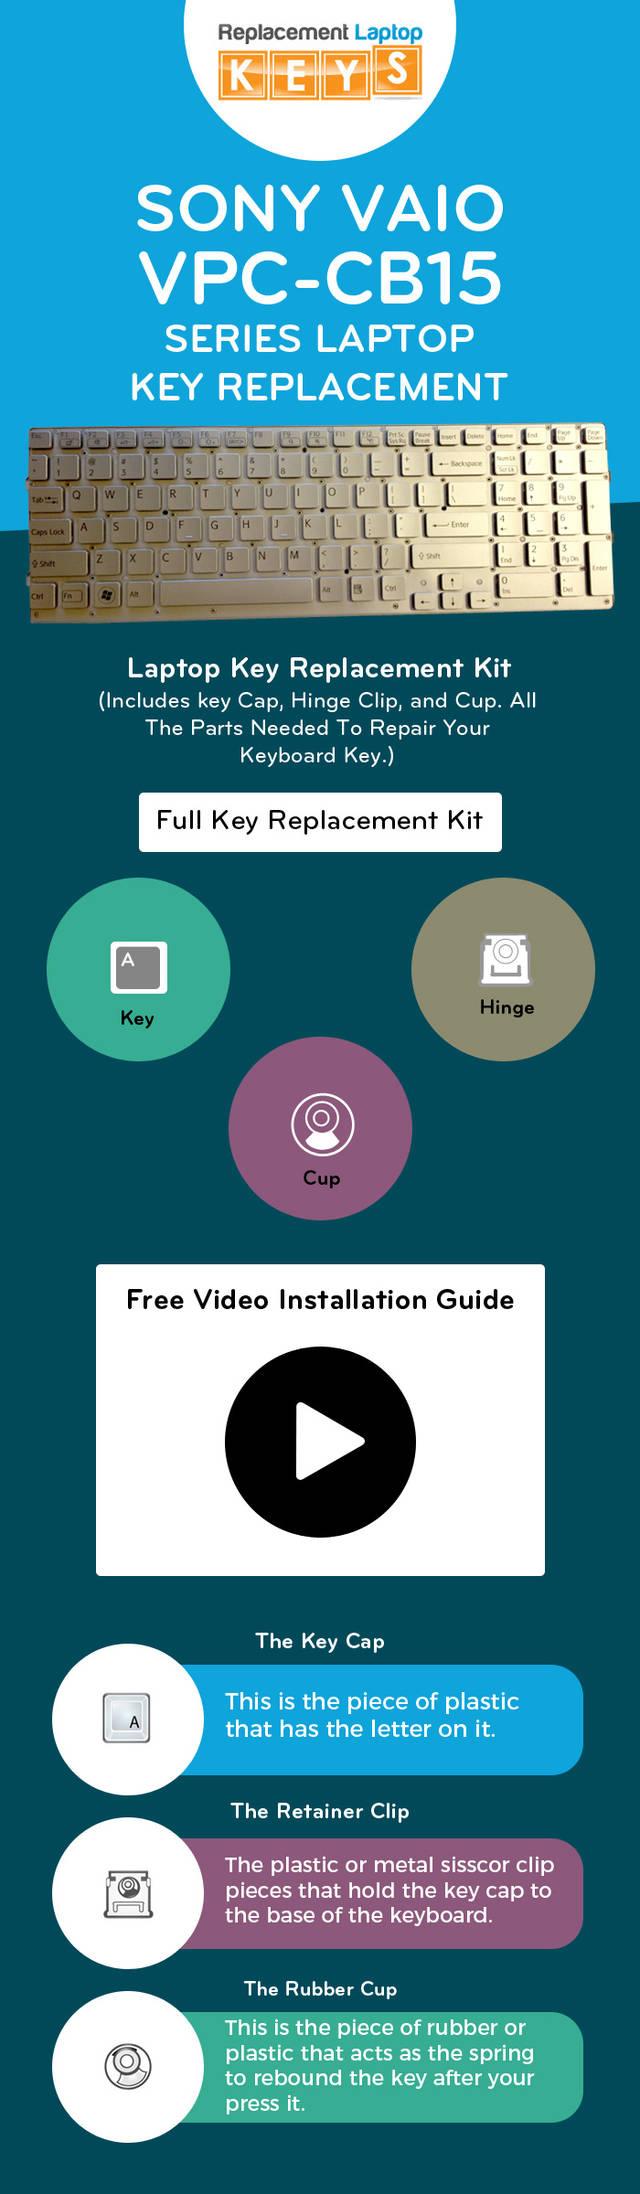 Buy sony vaio vpc cb15 series laptop replacement keys online